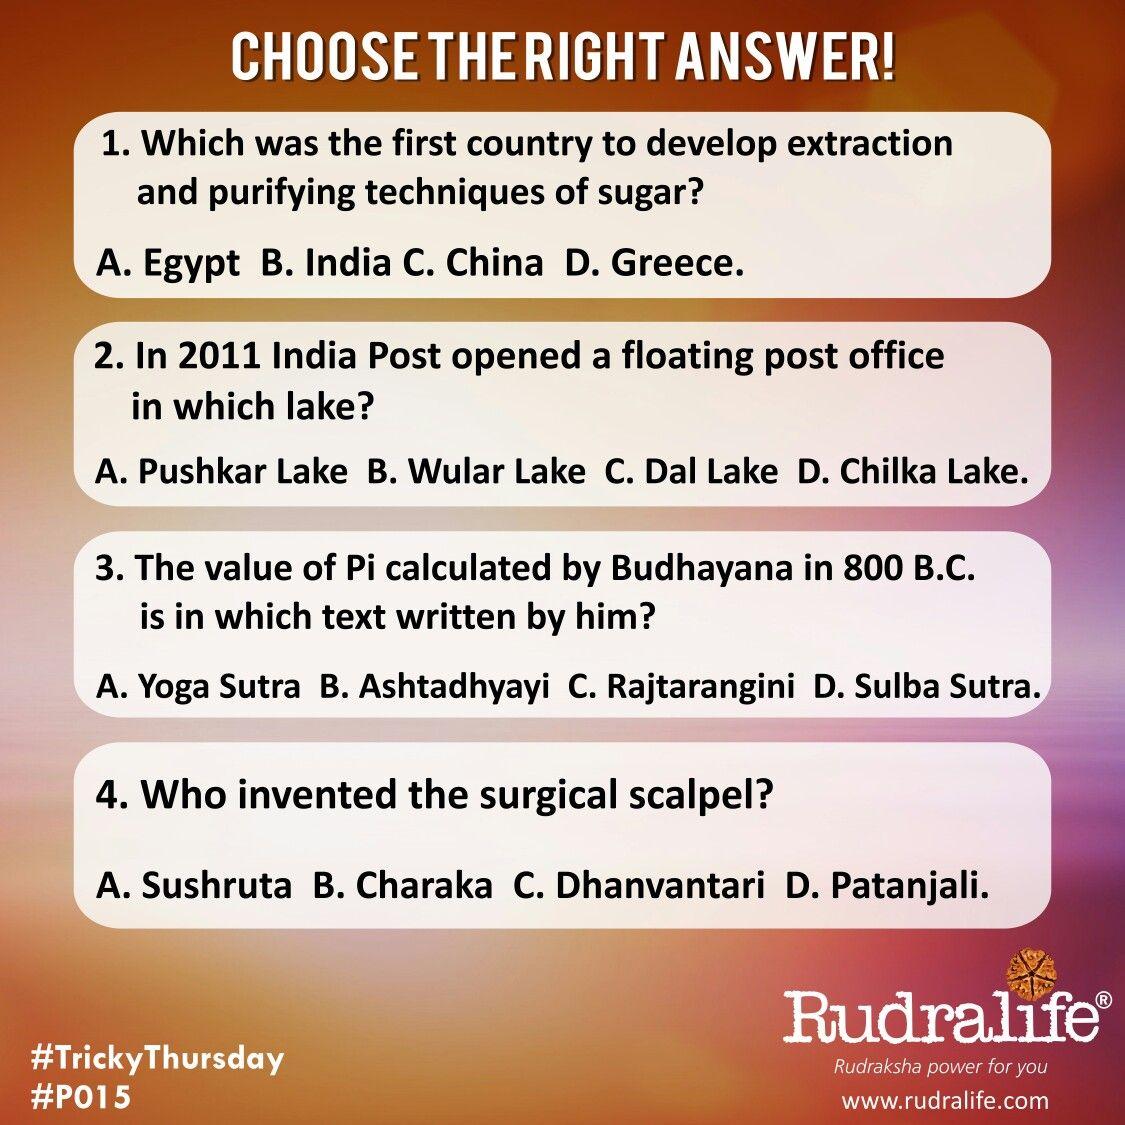 rudralife shiva TrickyThursday Puzzle Knowledge quiz